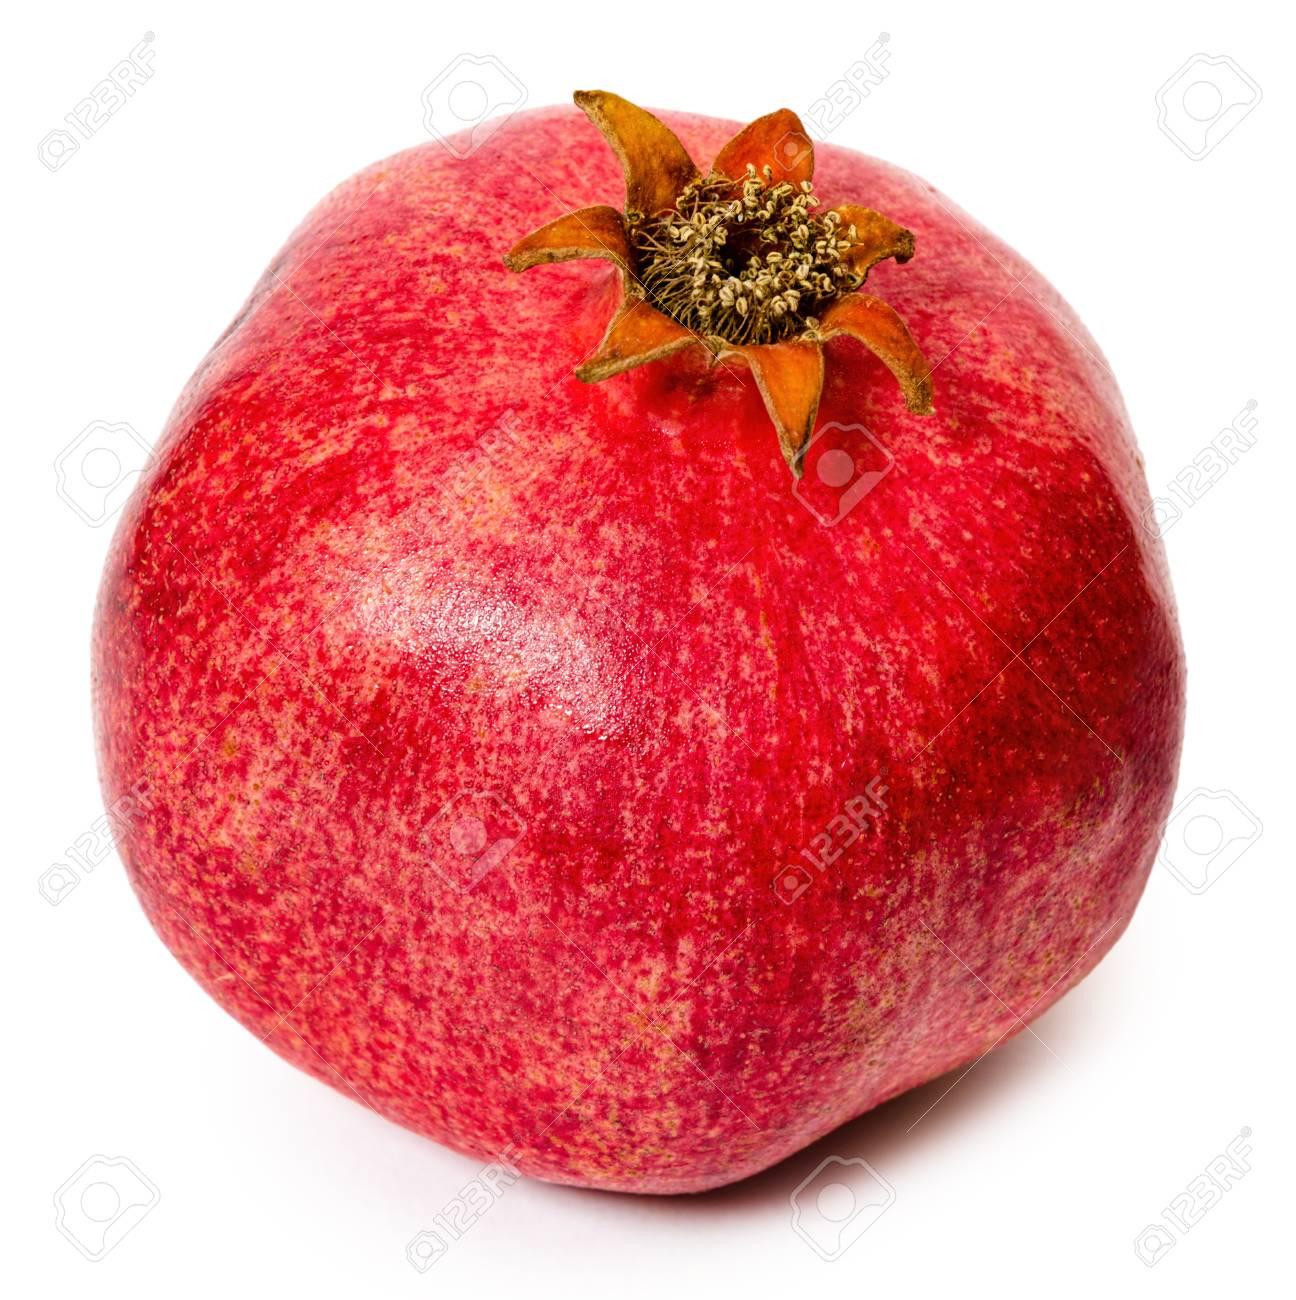 whole red fruit pomegranate full of vitamin juice antioxidant